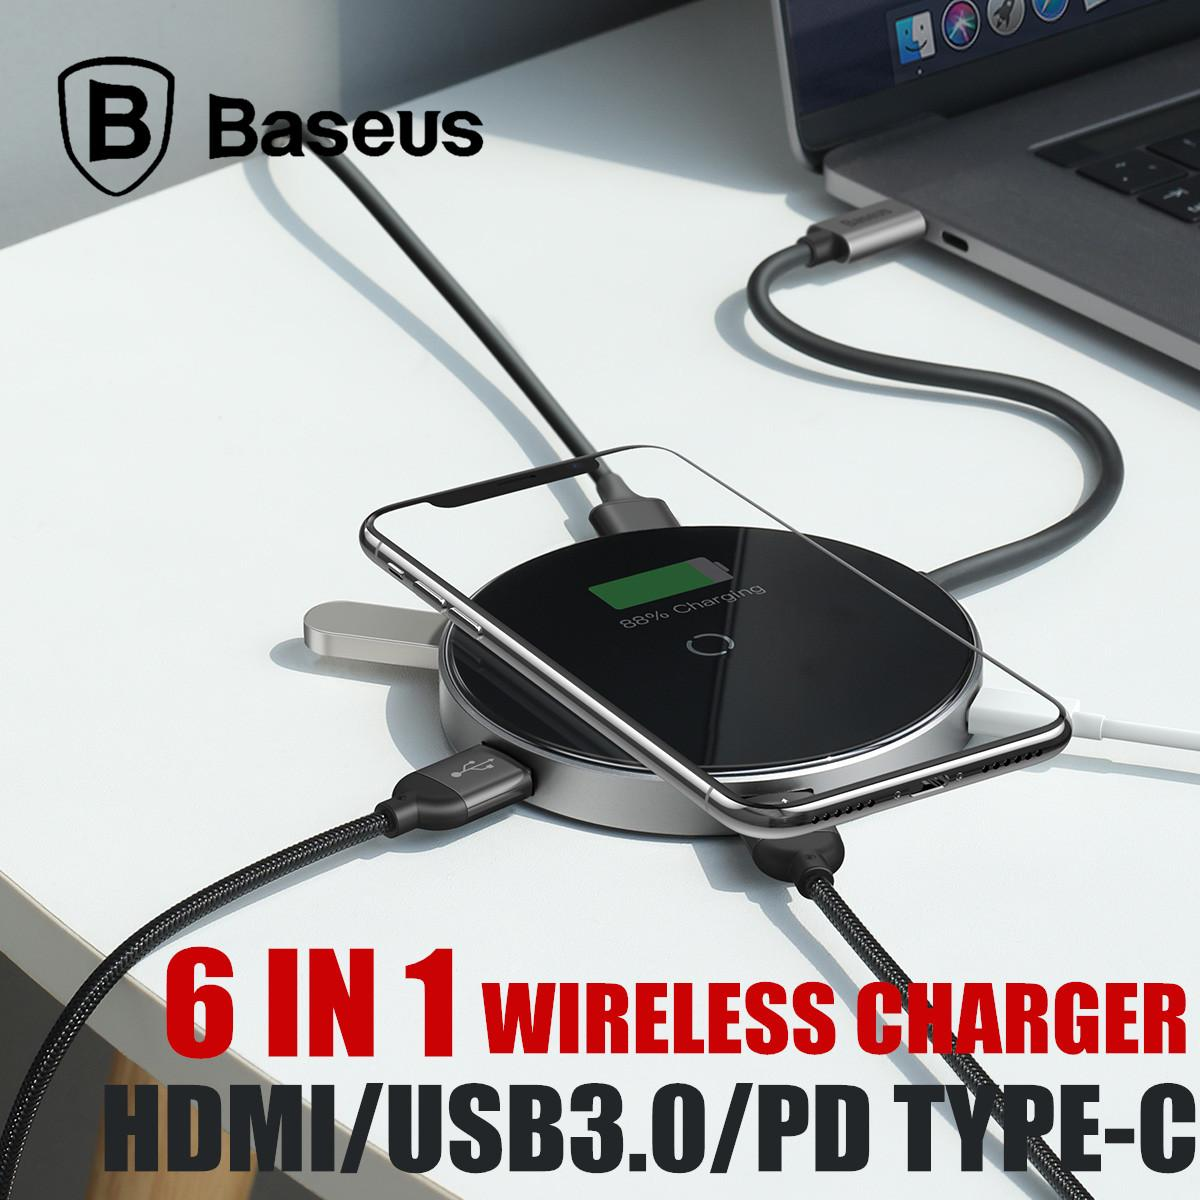 Baseus Circular Mirror Wireless Charger HDMI USB Type-C USB3.0 HUB Docking Station Macbook Huawei Lenovo Asus